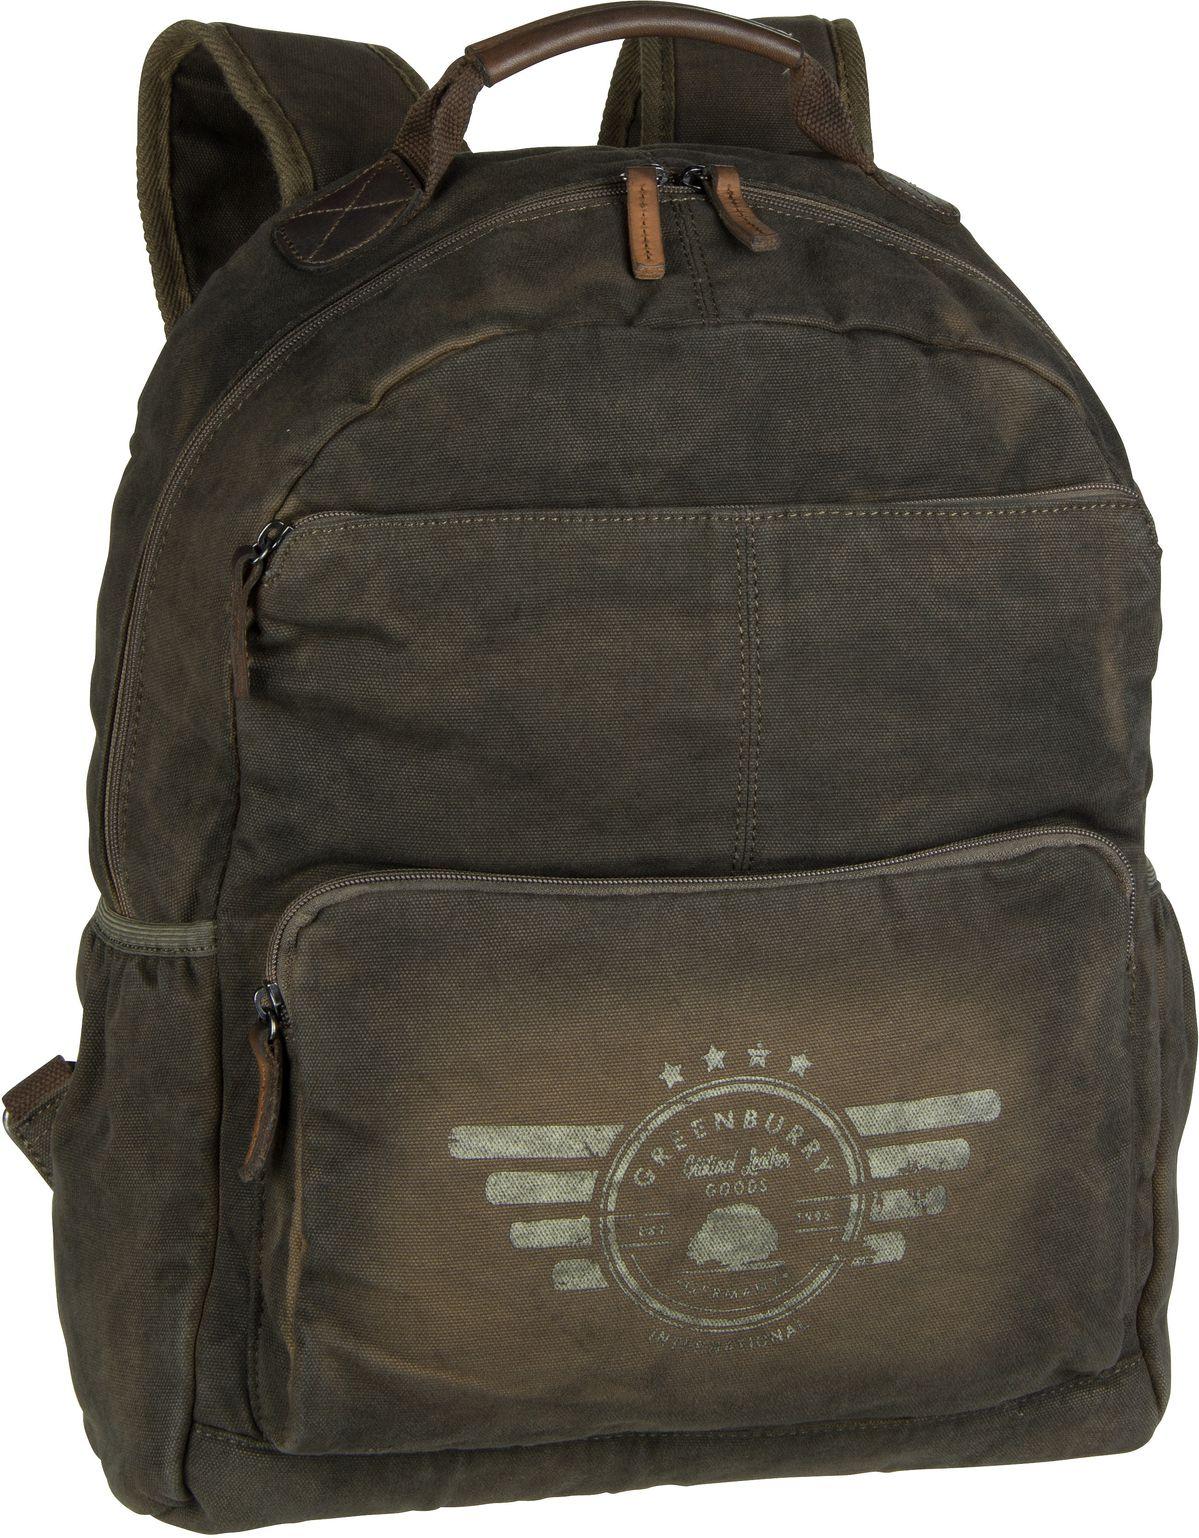 Rucksack / Daypack Vintage Aviator 5908 Backpack Khaki